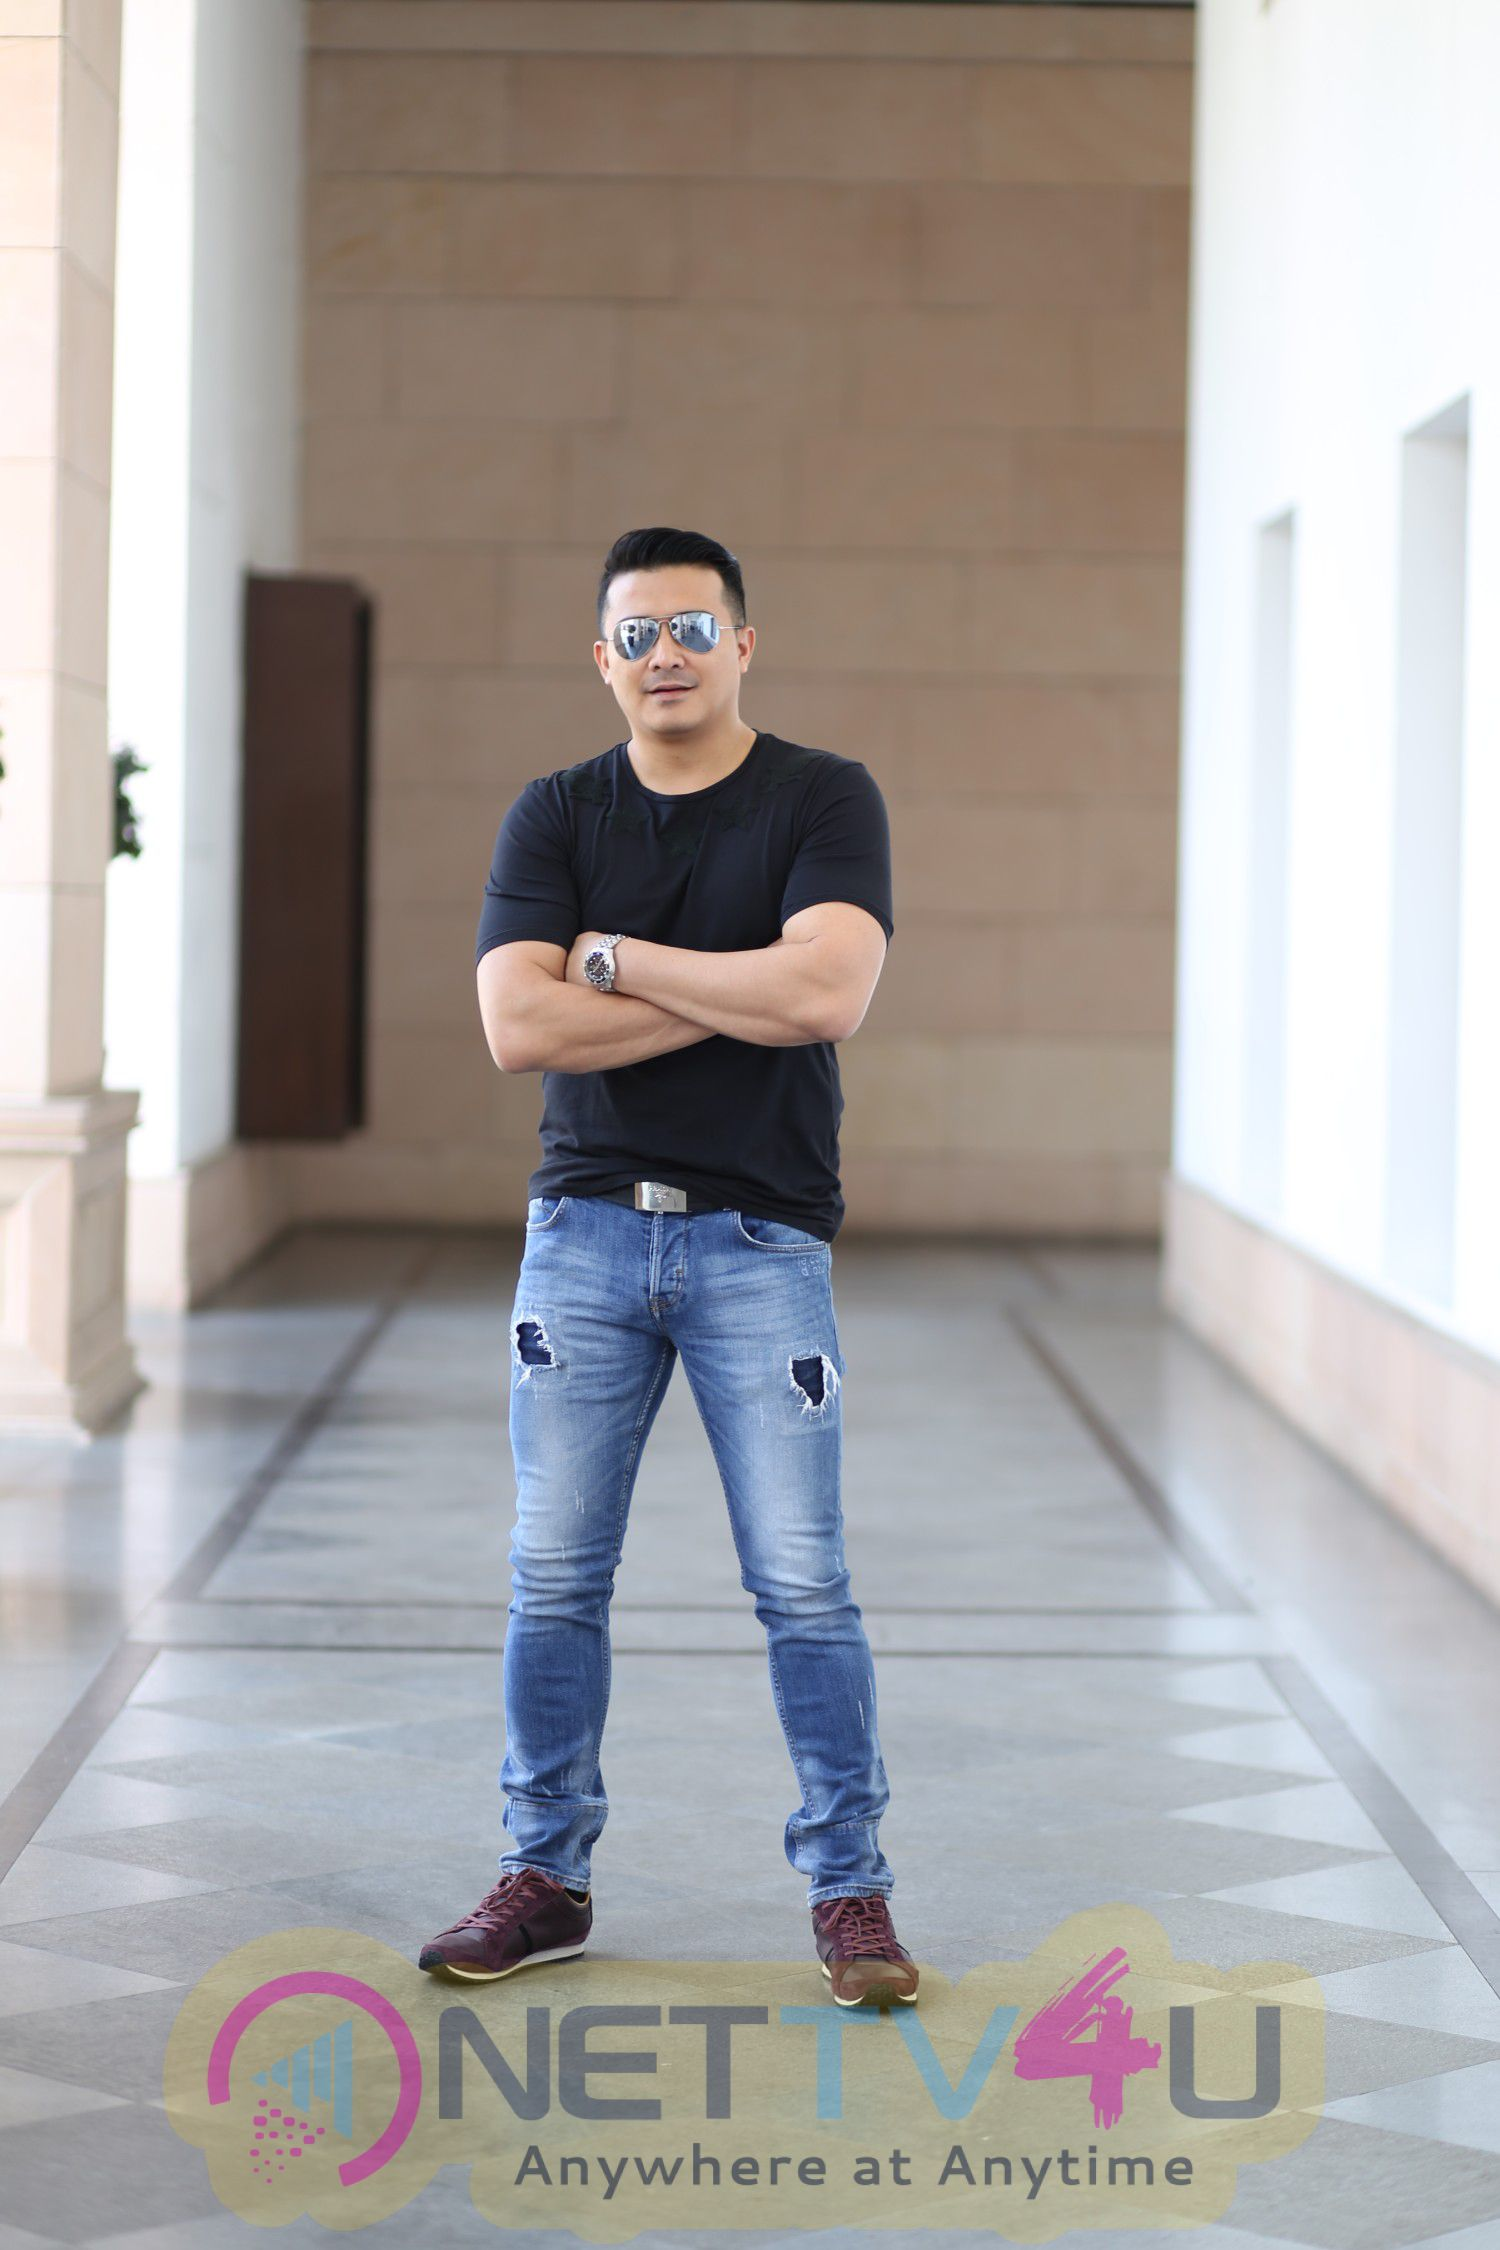 Singapore Actor Joins TIK TIK TIK Crew